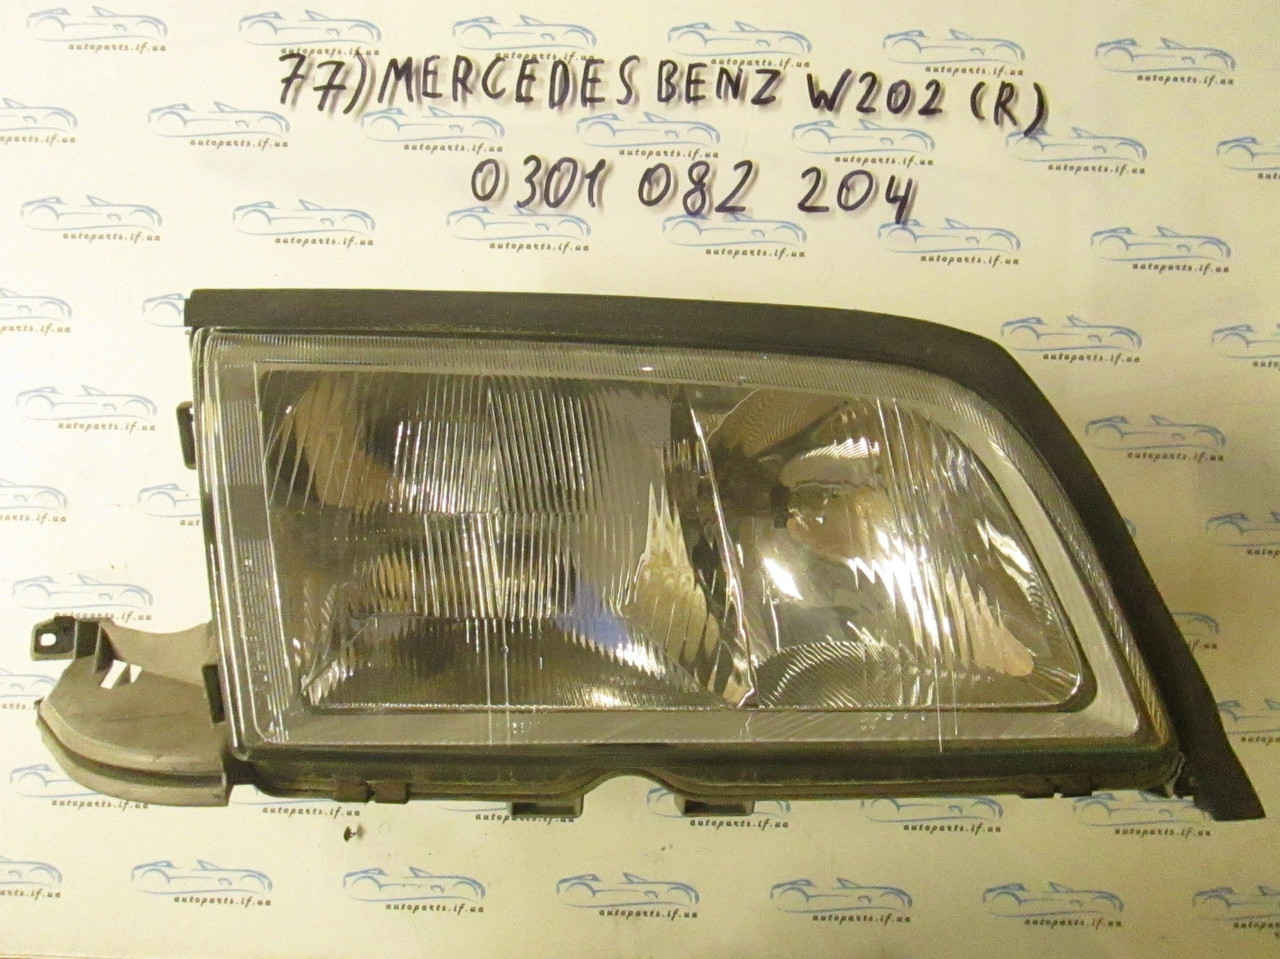 Фара правая Mercedes W202, Мерседес 202 0301082204 №77